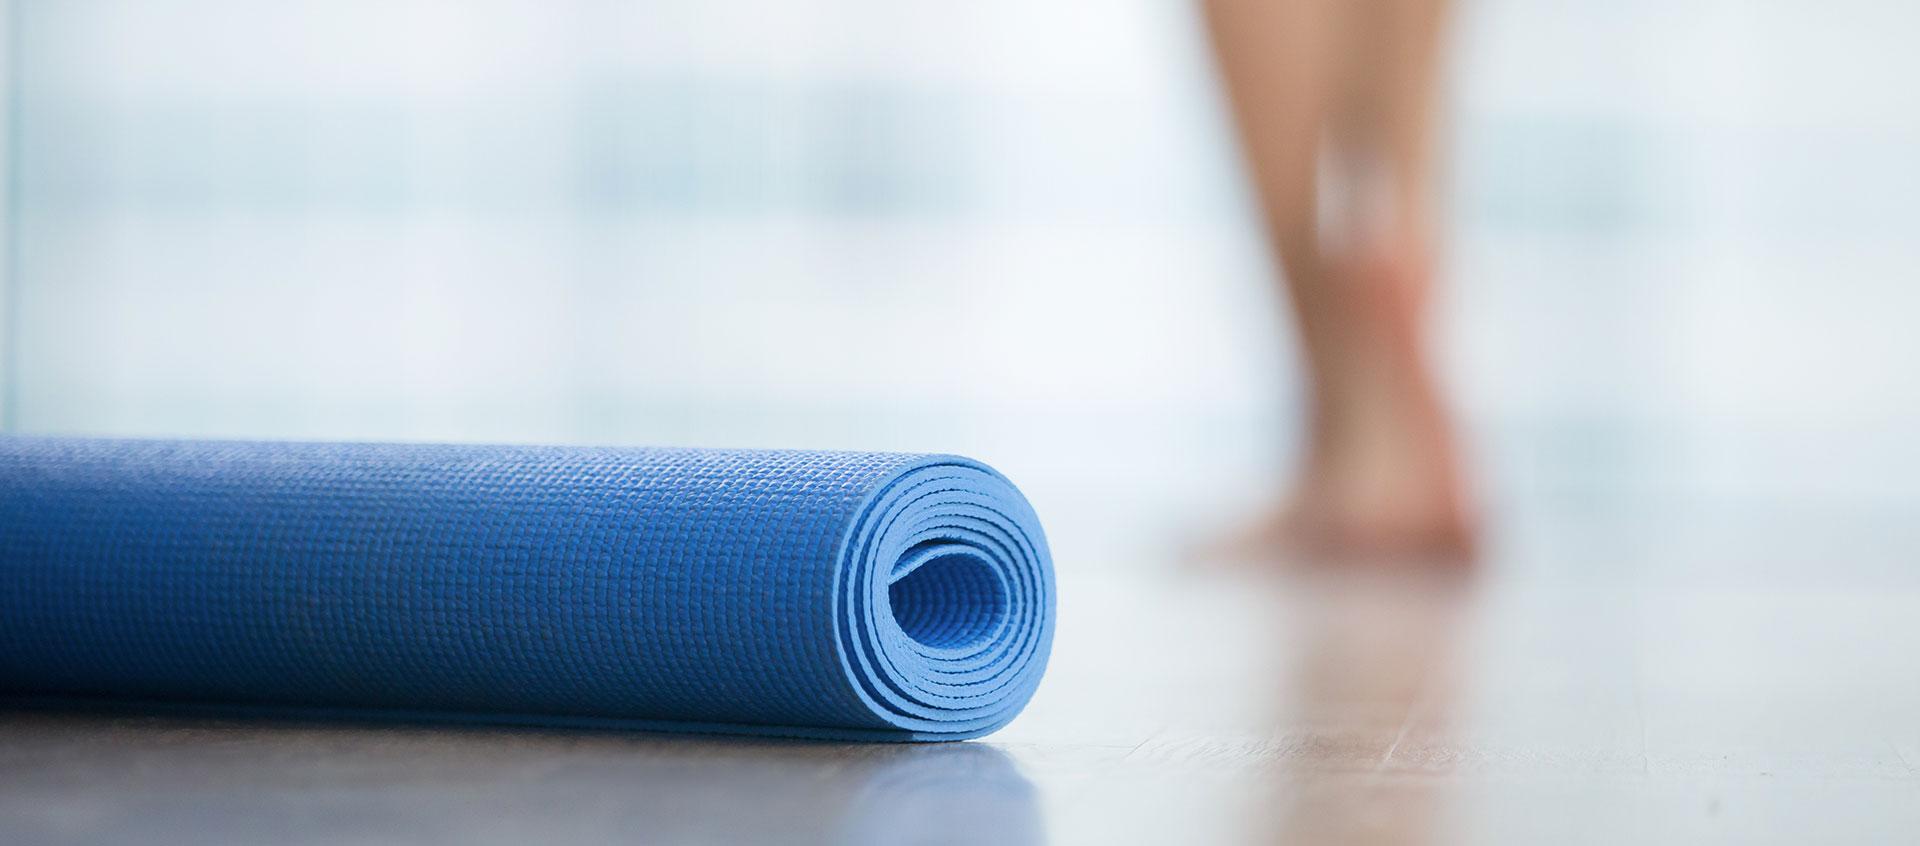 Yoga Beyond The Mat The Deeper Draw Of Yoga Psychology Kripalu